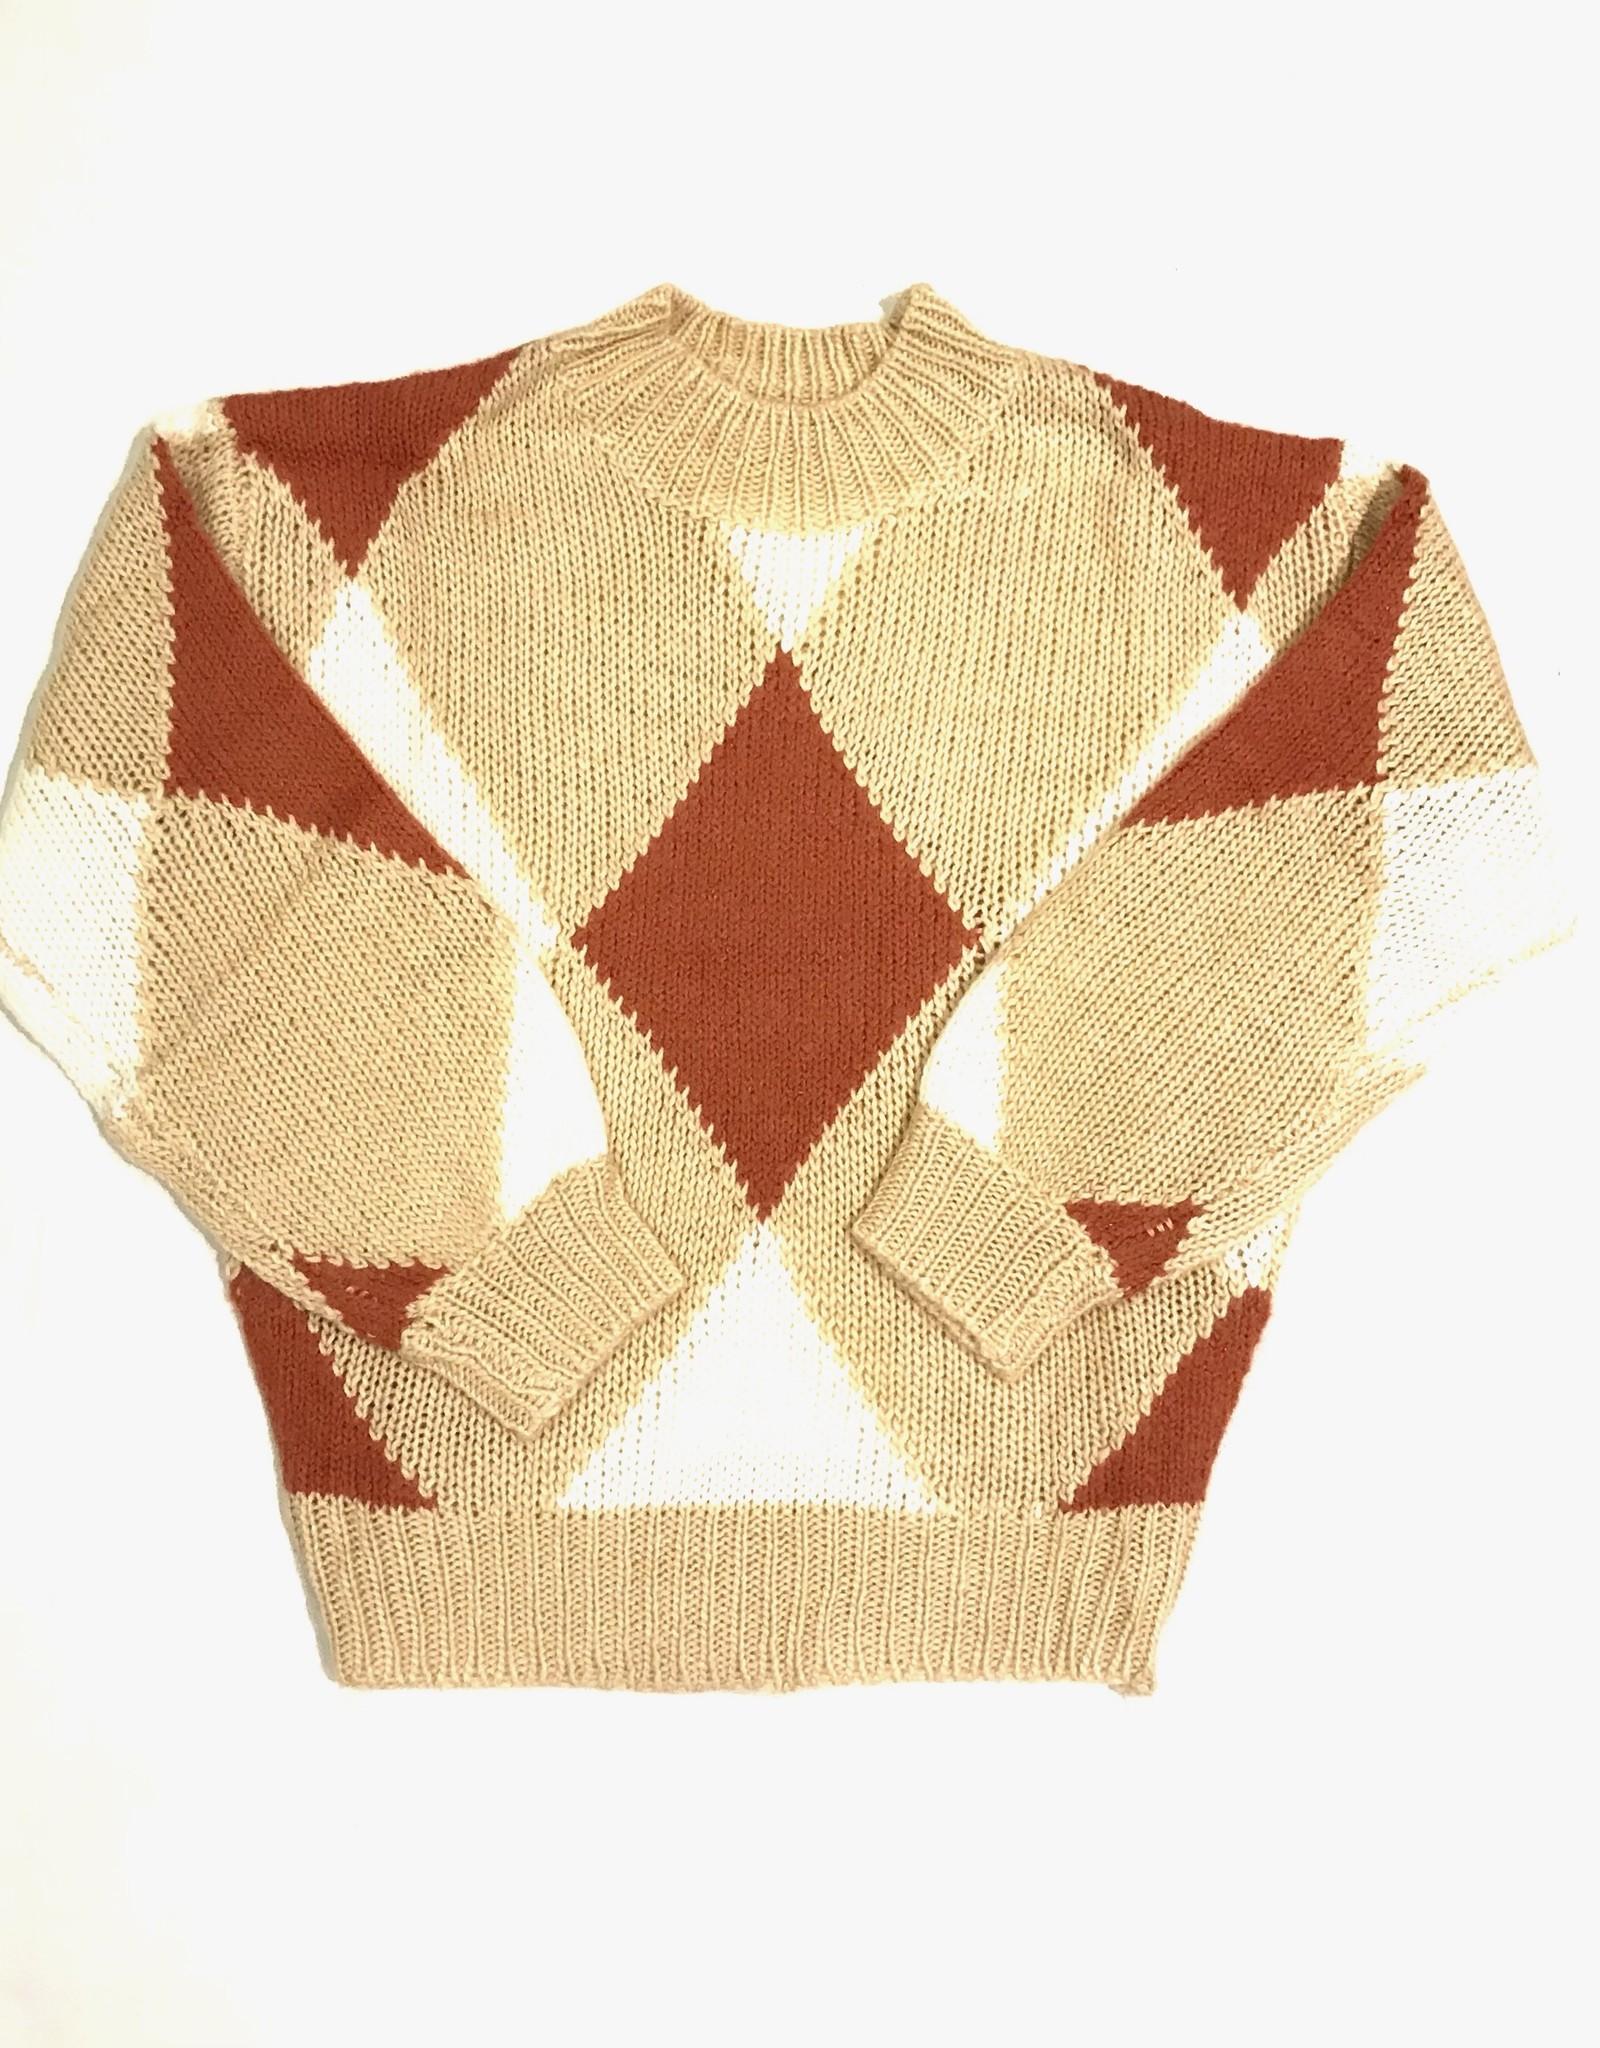 lush argyle mockneck sweater LT16099